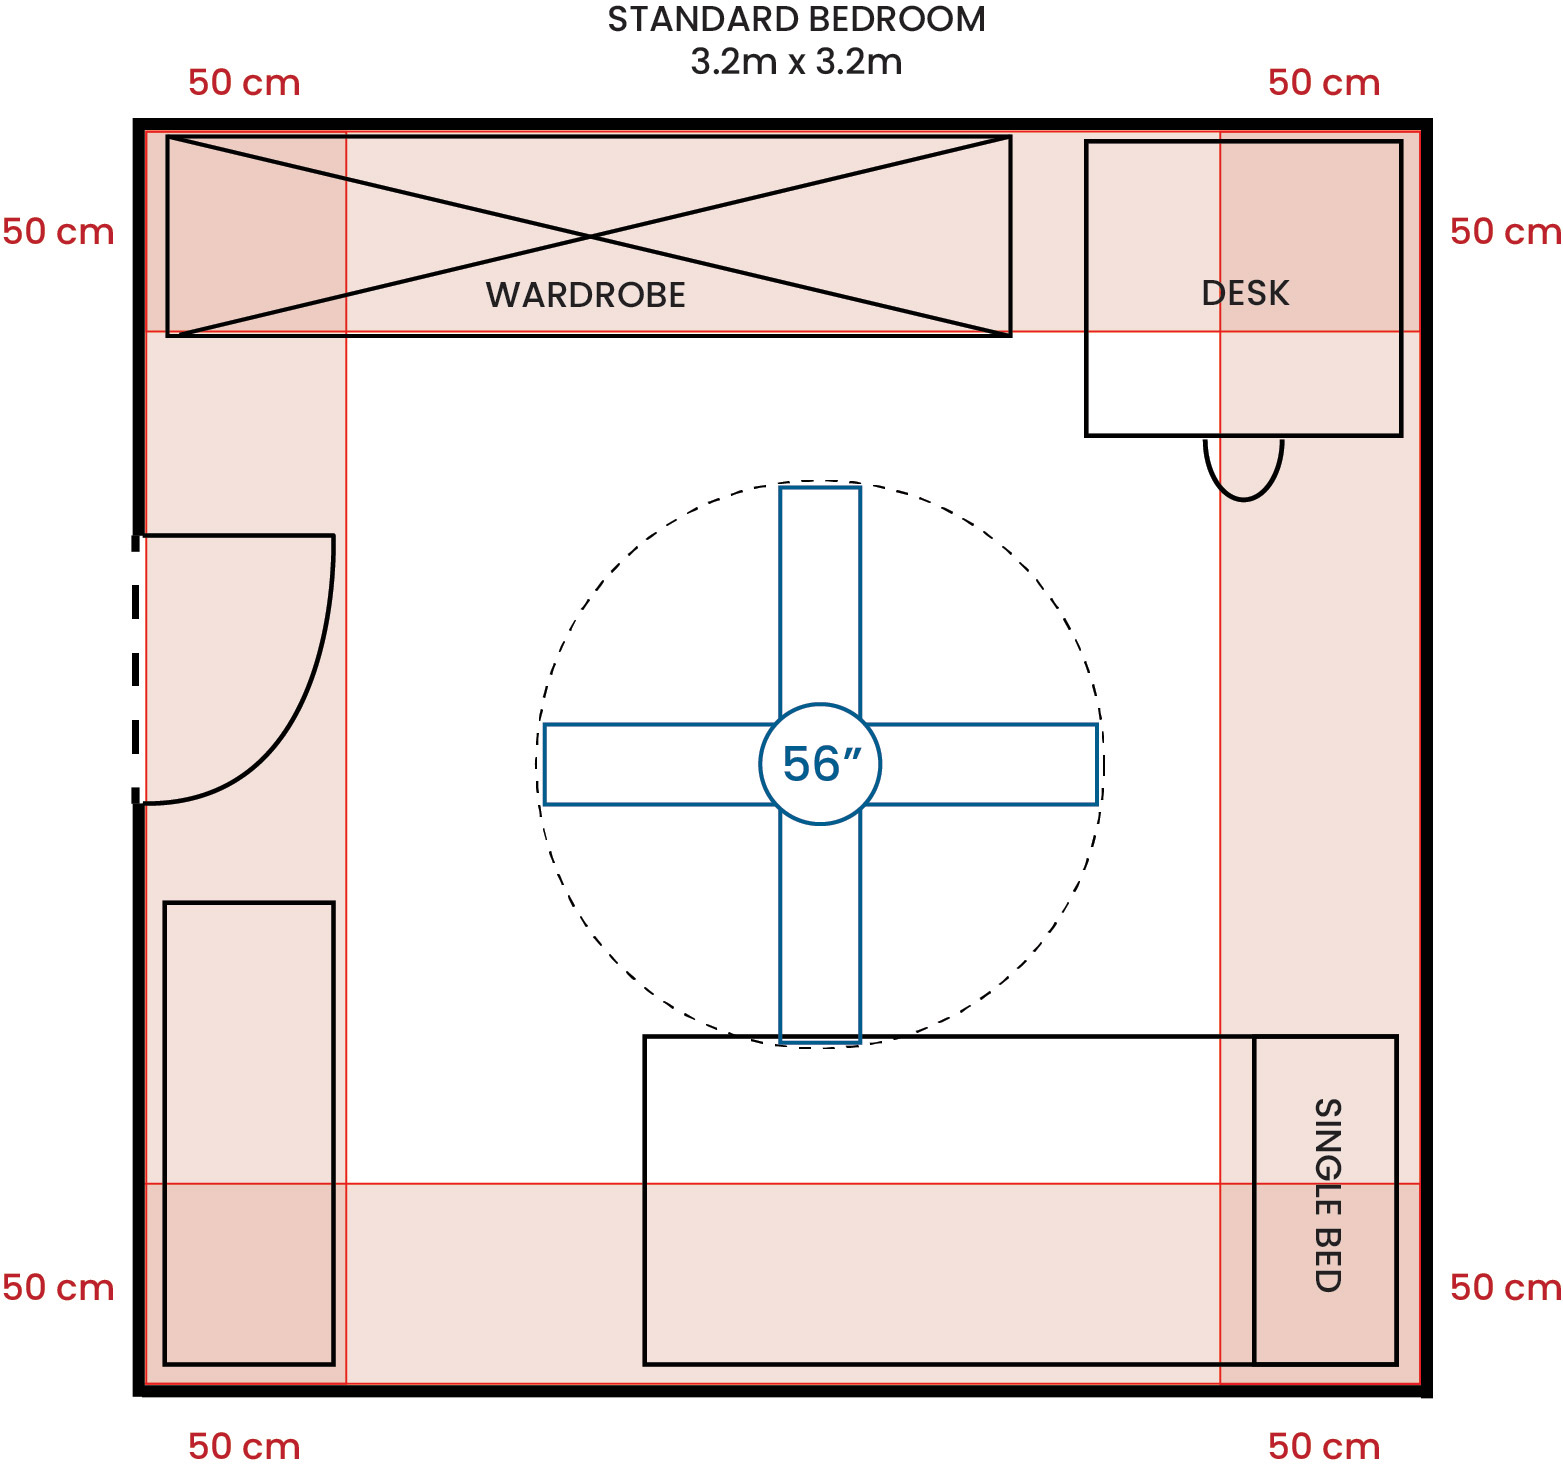 Standard Bedroom 320 320 56F G